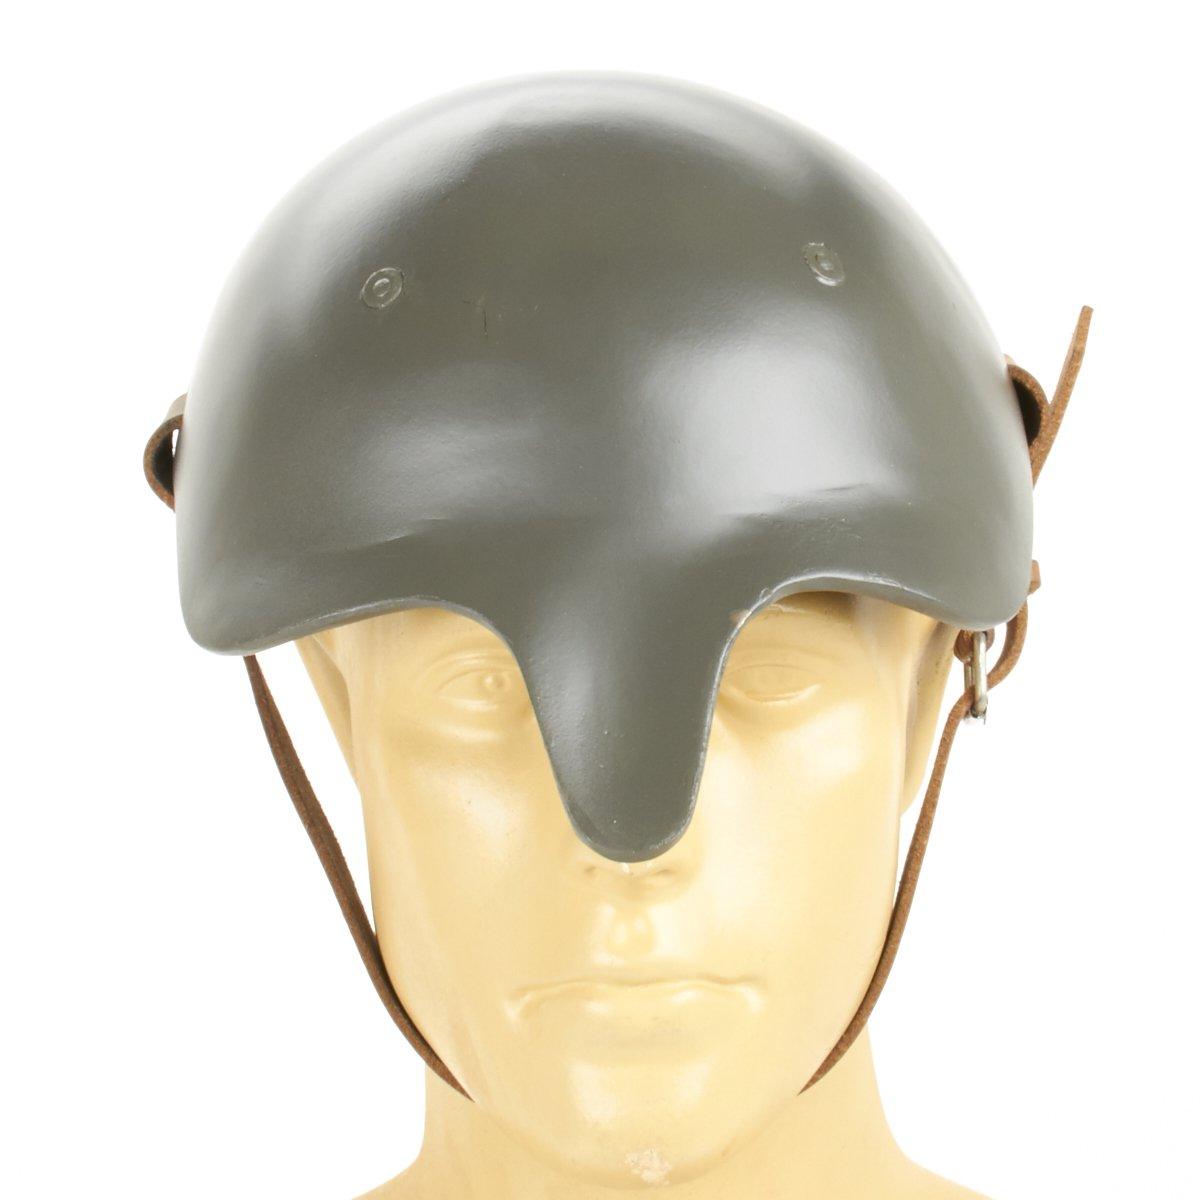 Ww1 German Helmet Replica For Sale : Ash Cycles